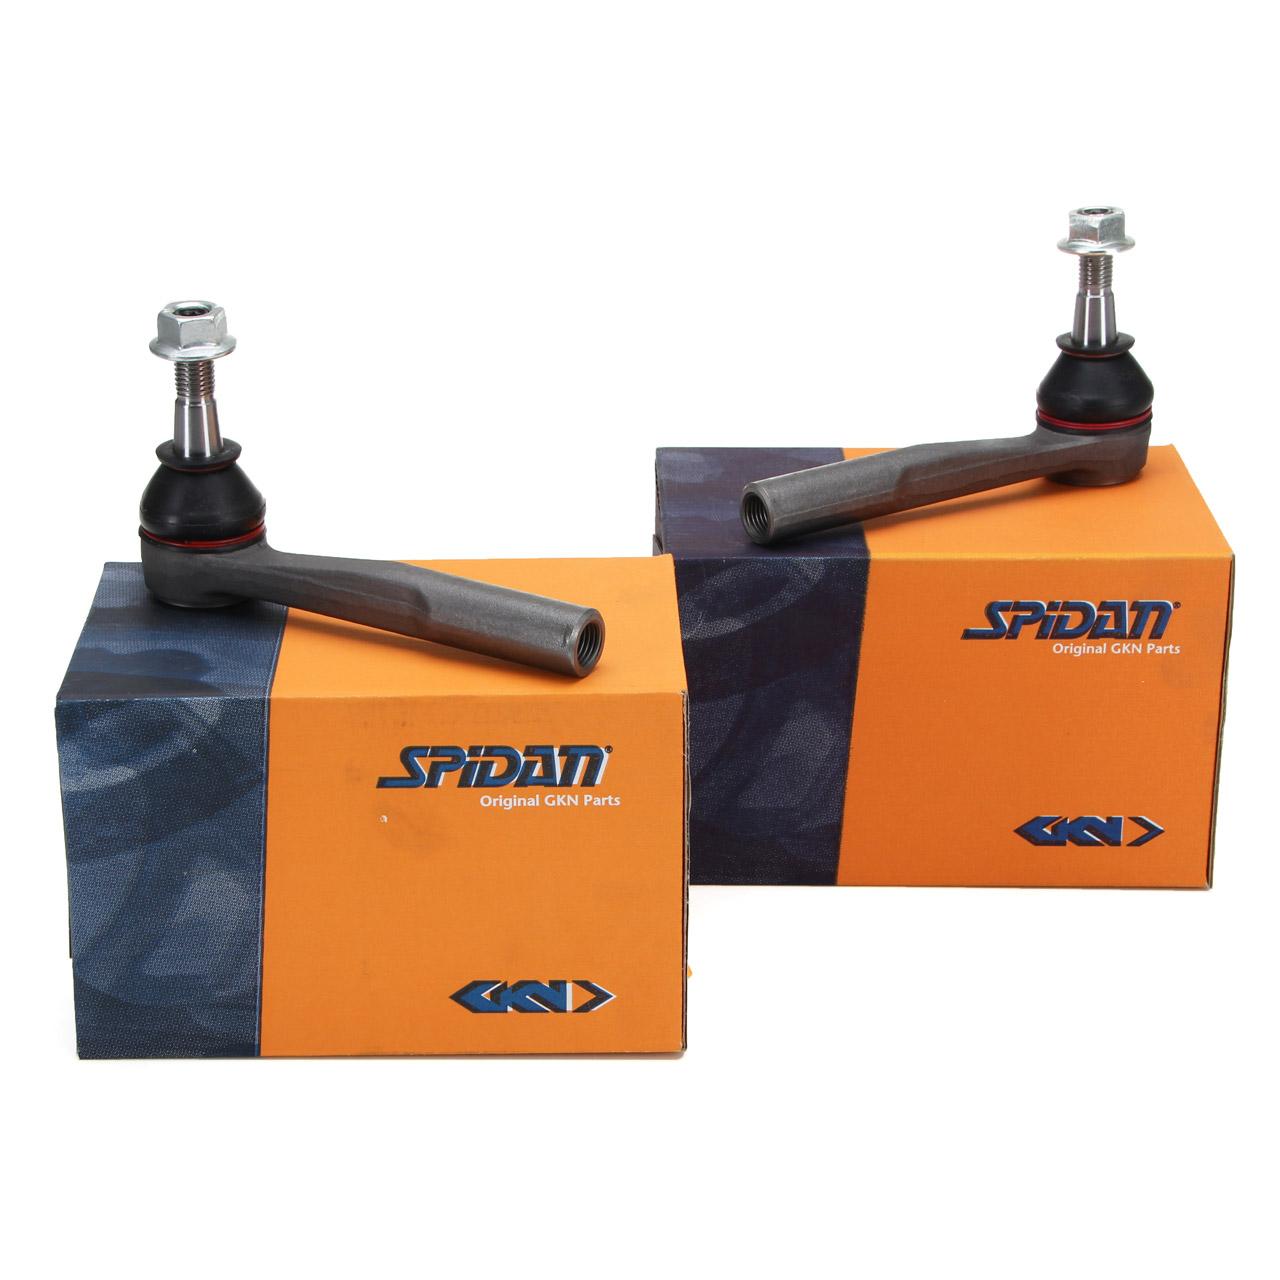 2x SPIDAN Spurstangenkopf FIAT Croma OPEL Signum Vectra C SAAB 9-3 9-5 vorne